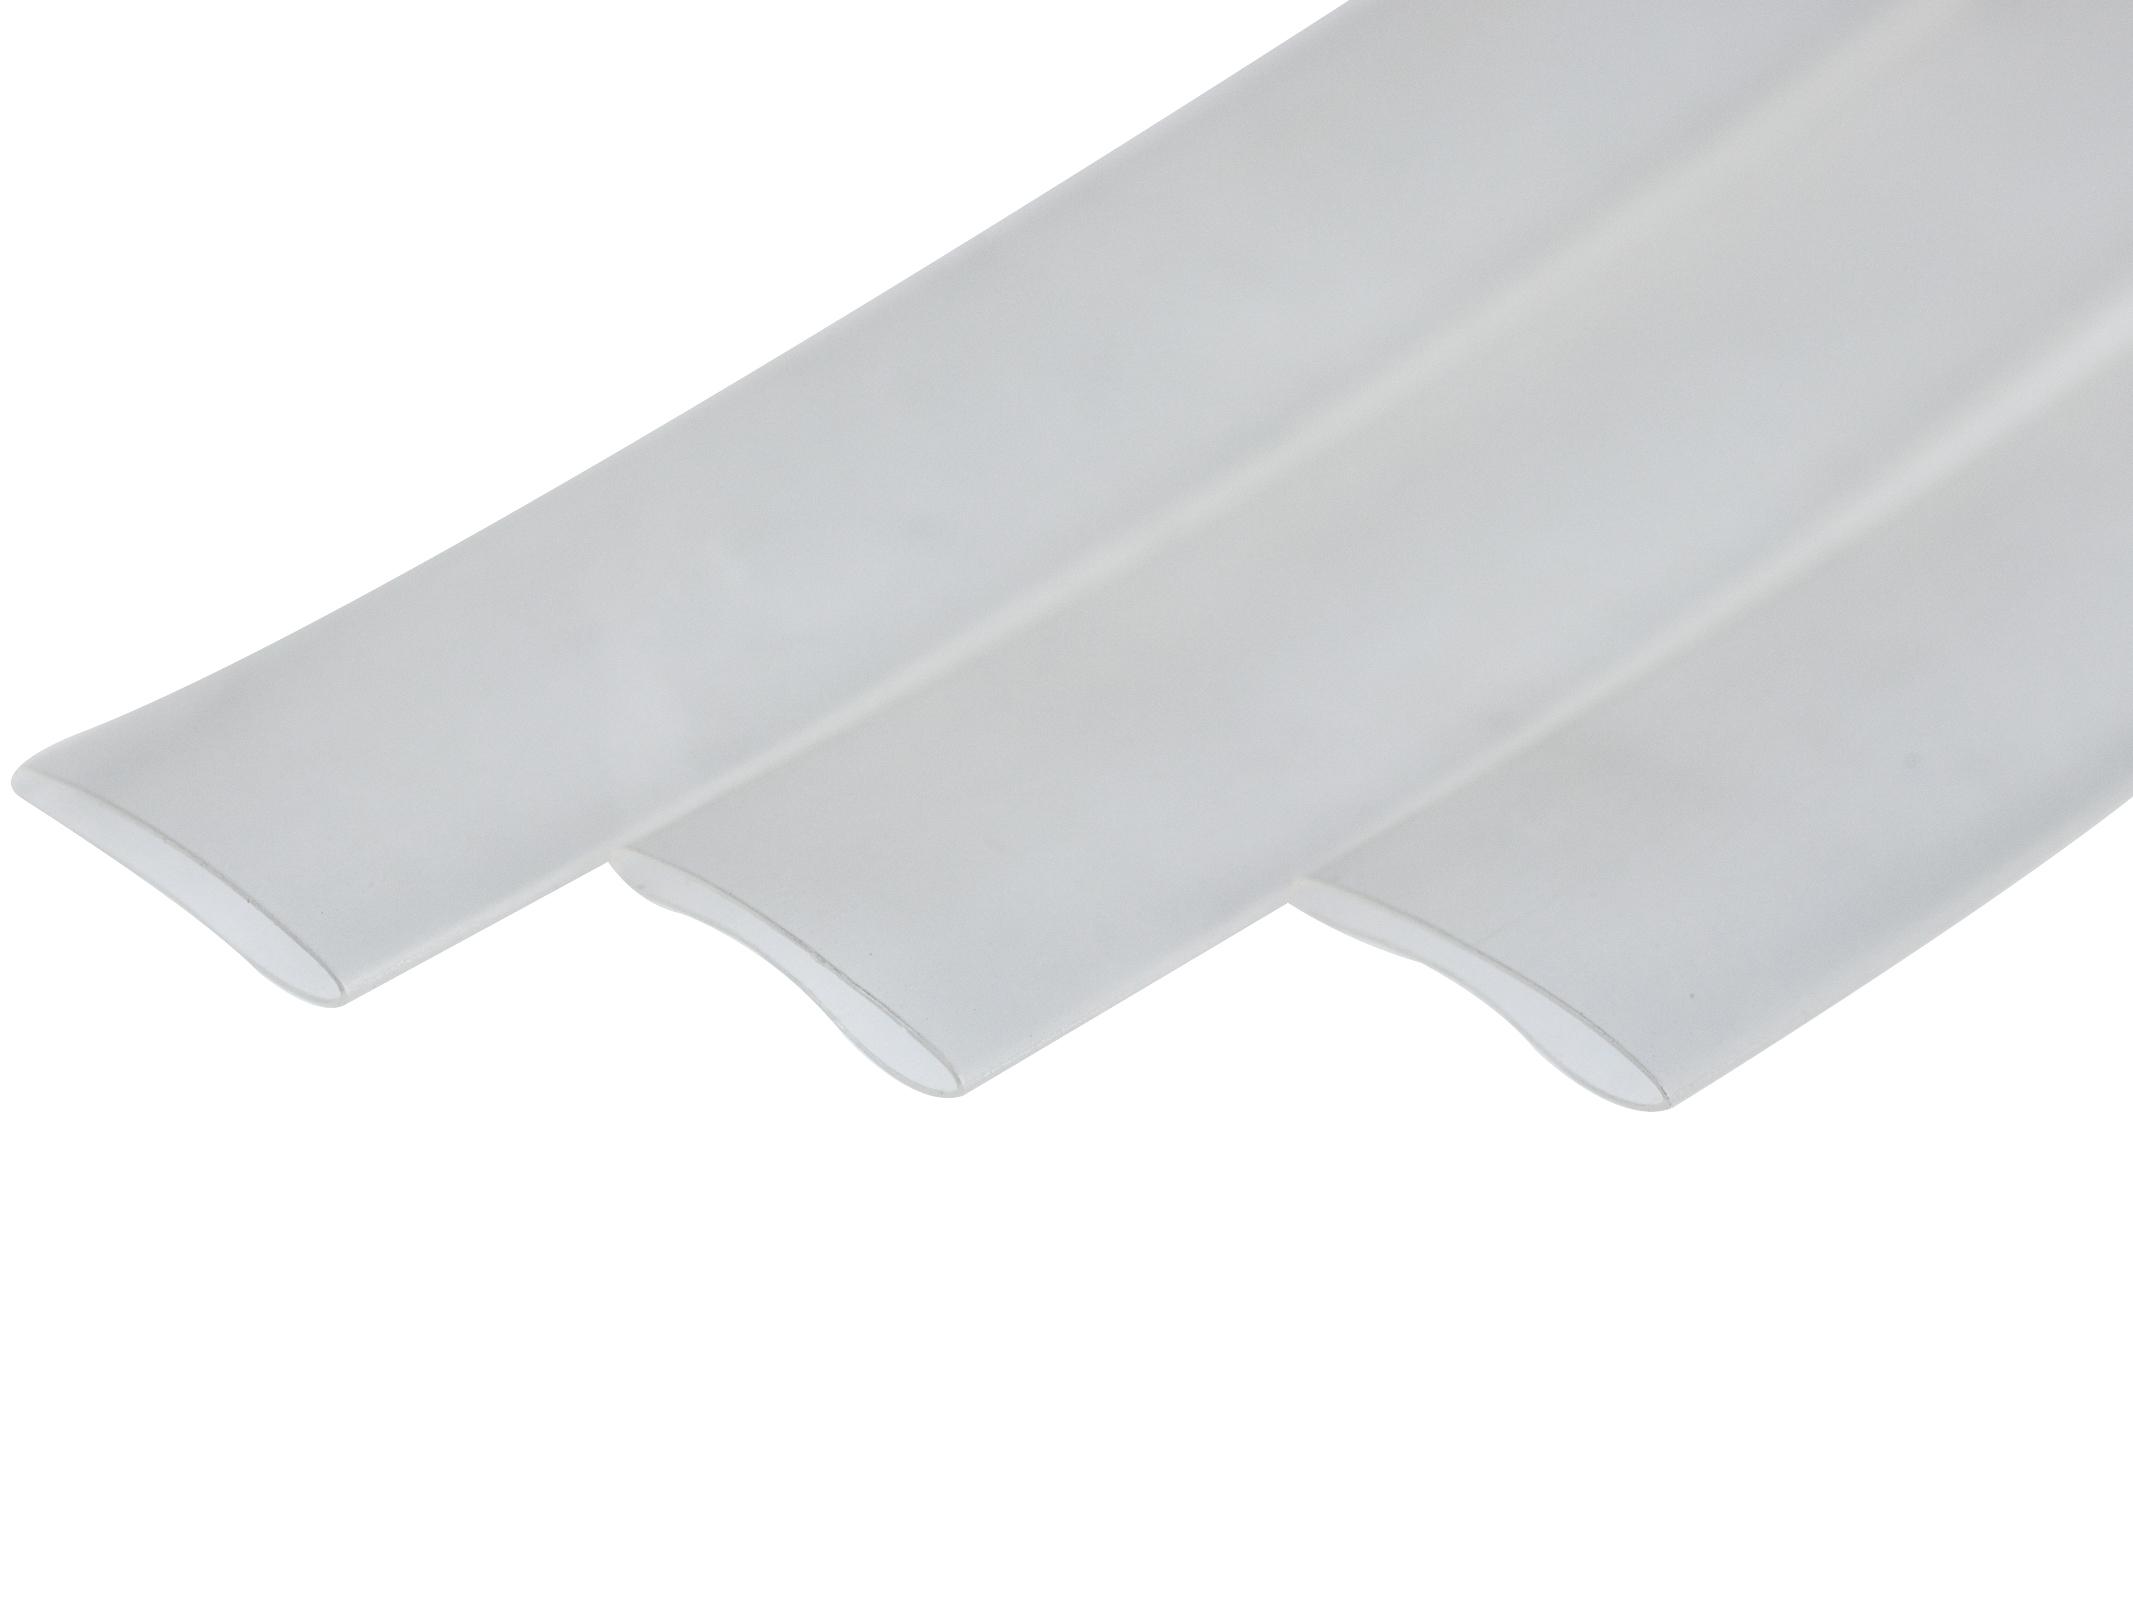 12mm Black Heatshrink Insulation x3 metres 12.7mm Heat Shrink Sleeve Black